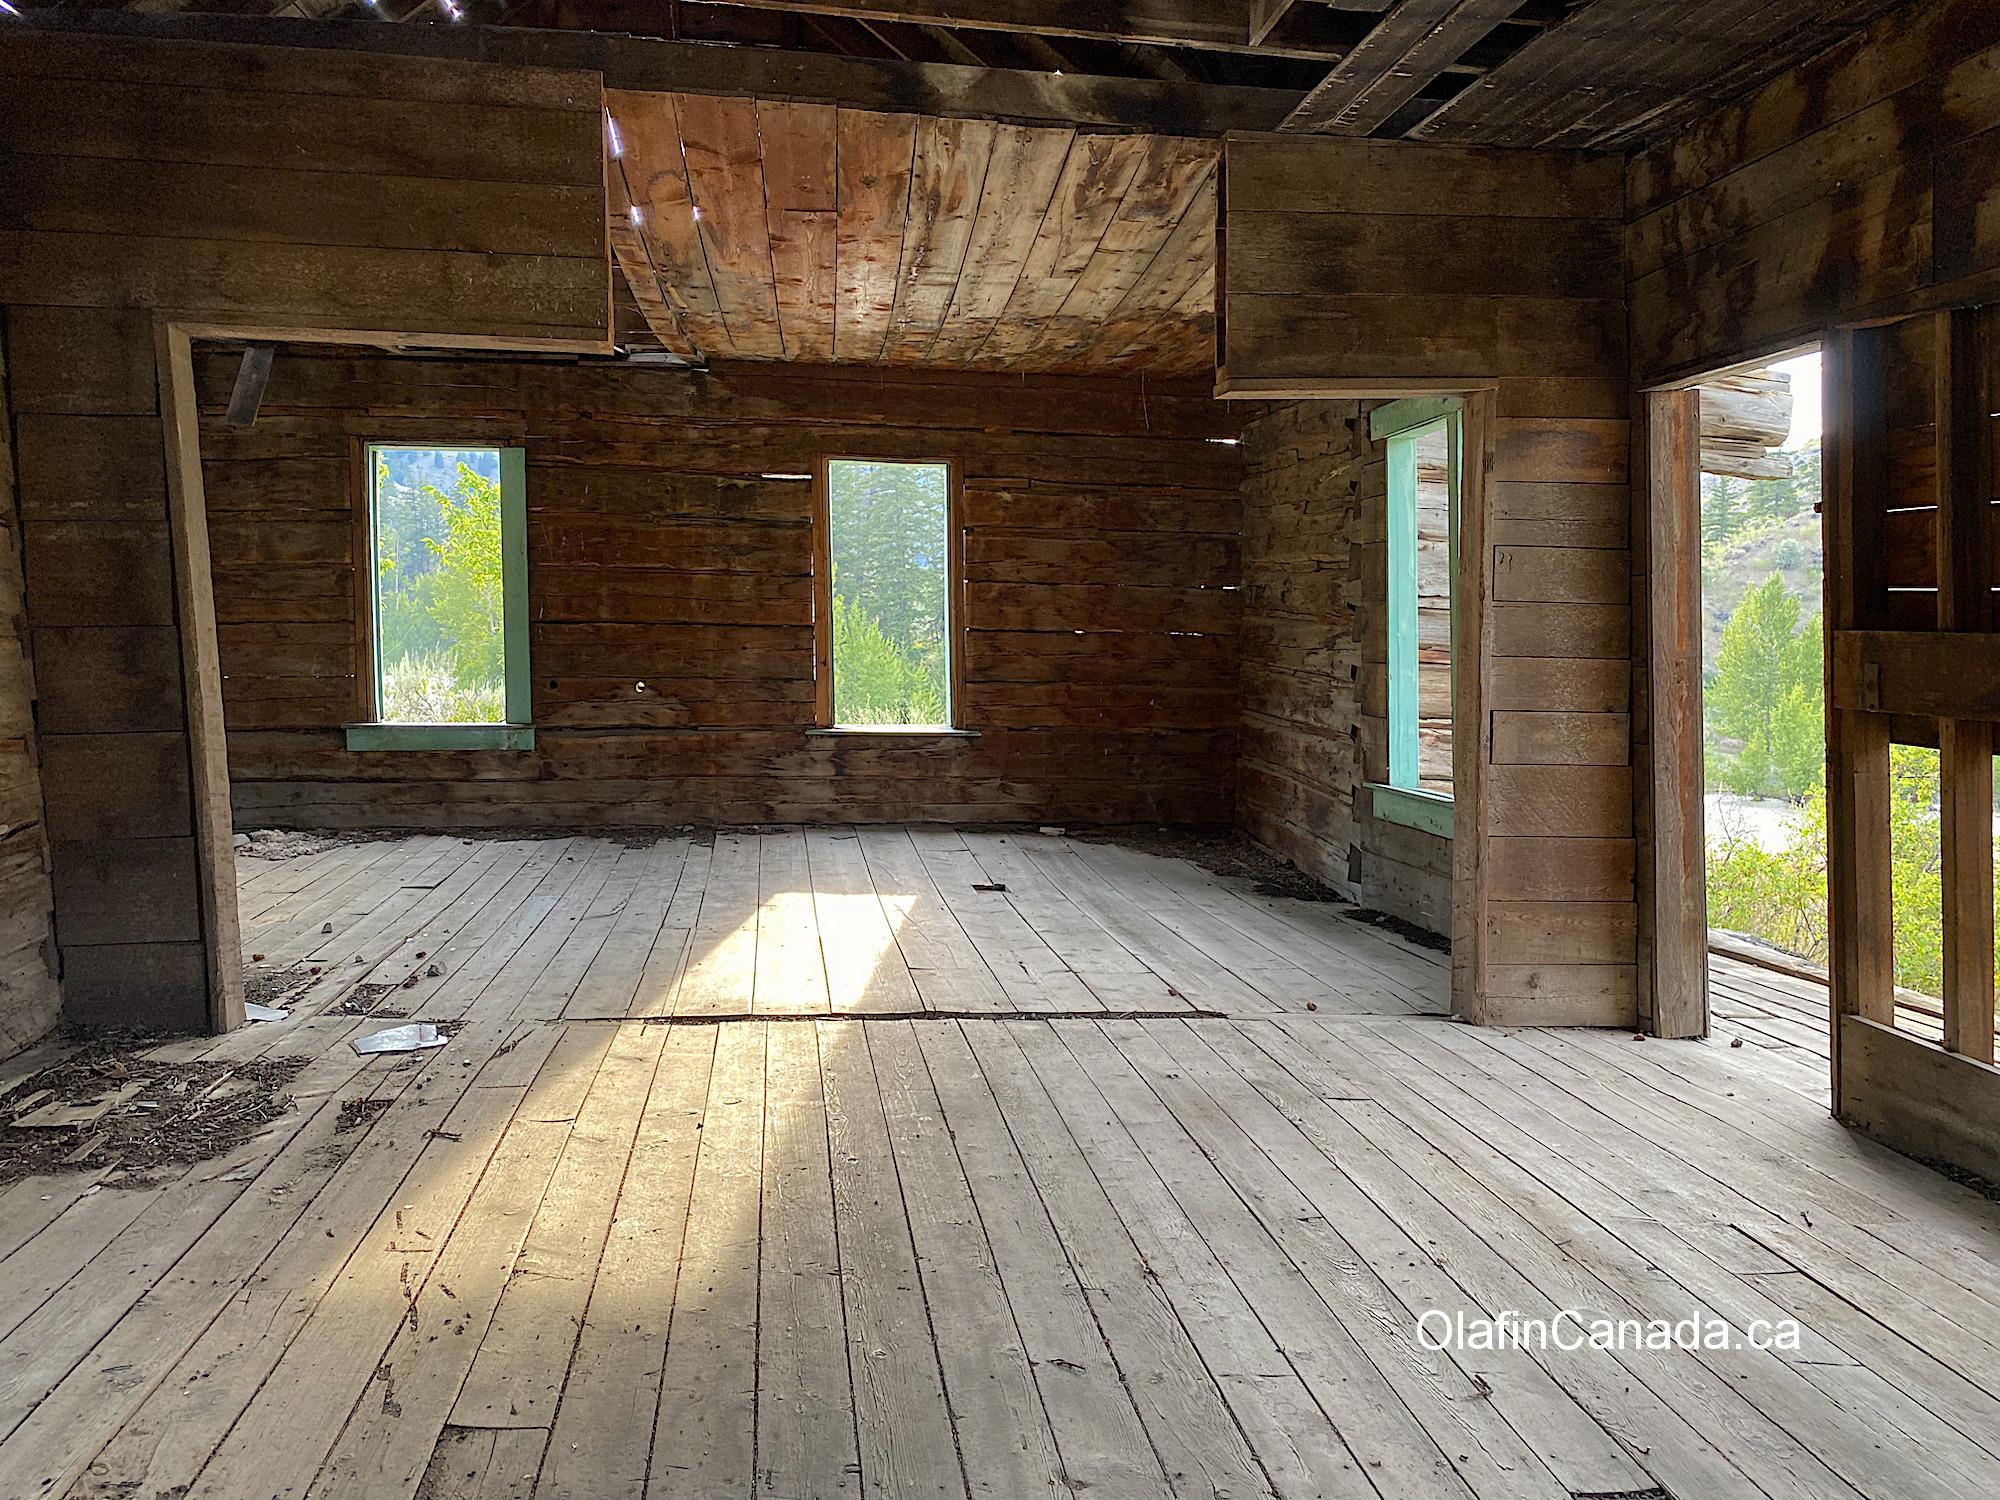 Interior of the homestead of the Pothole Ranch at sunset #olafincanada #britishcolumbia #discoverbc #abandonedbc #chilcotin #farwellcanyon #potholeranch #homestead